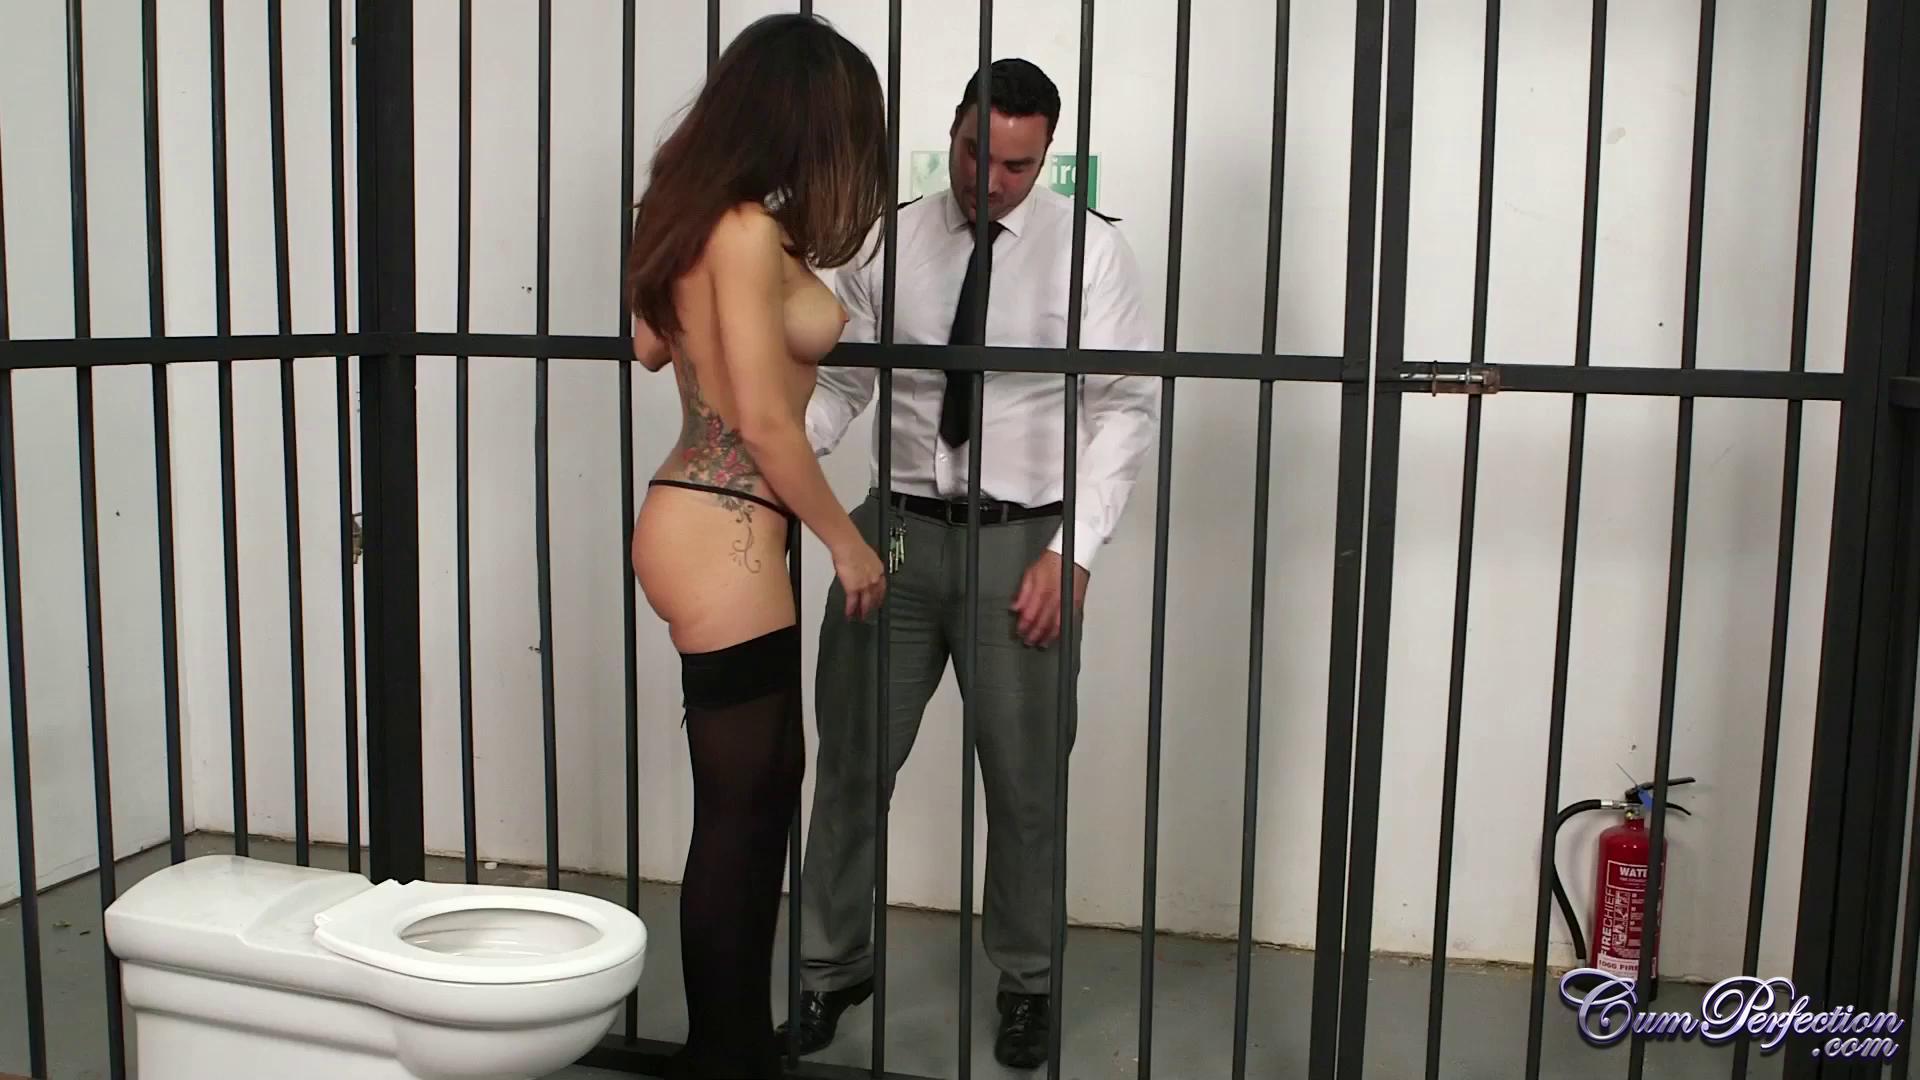 CumPerfection – Julia De Lucia Mistaken For A Prostitute